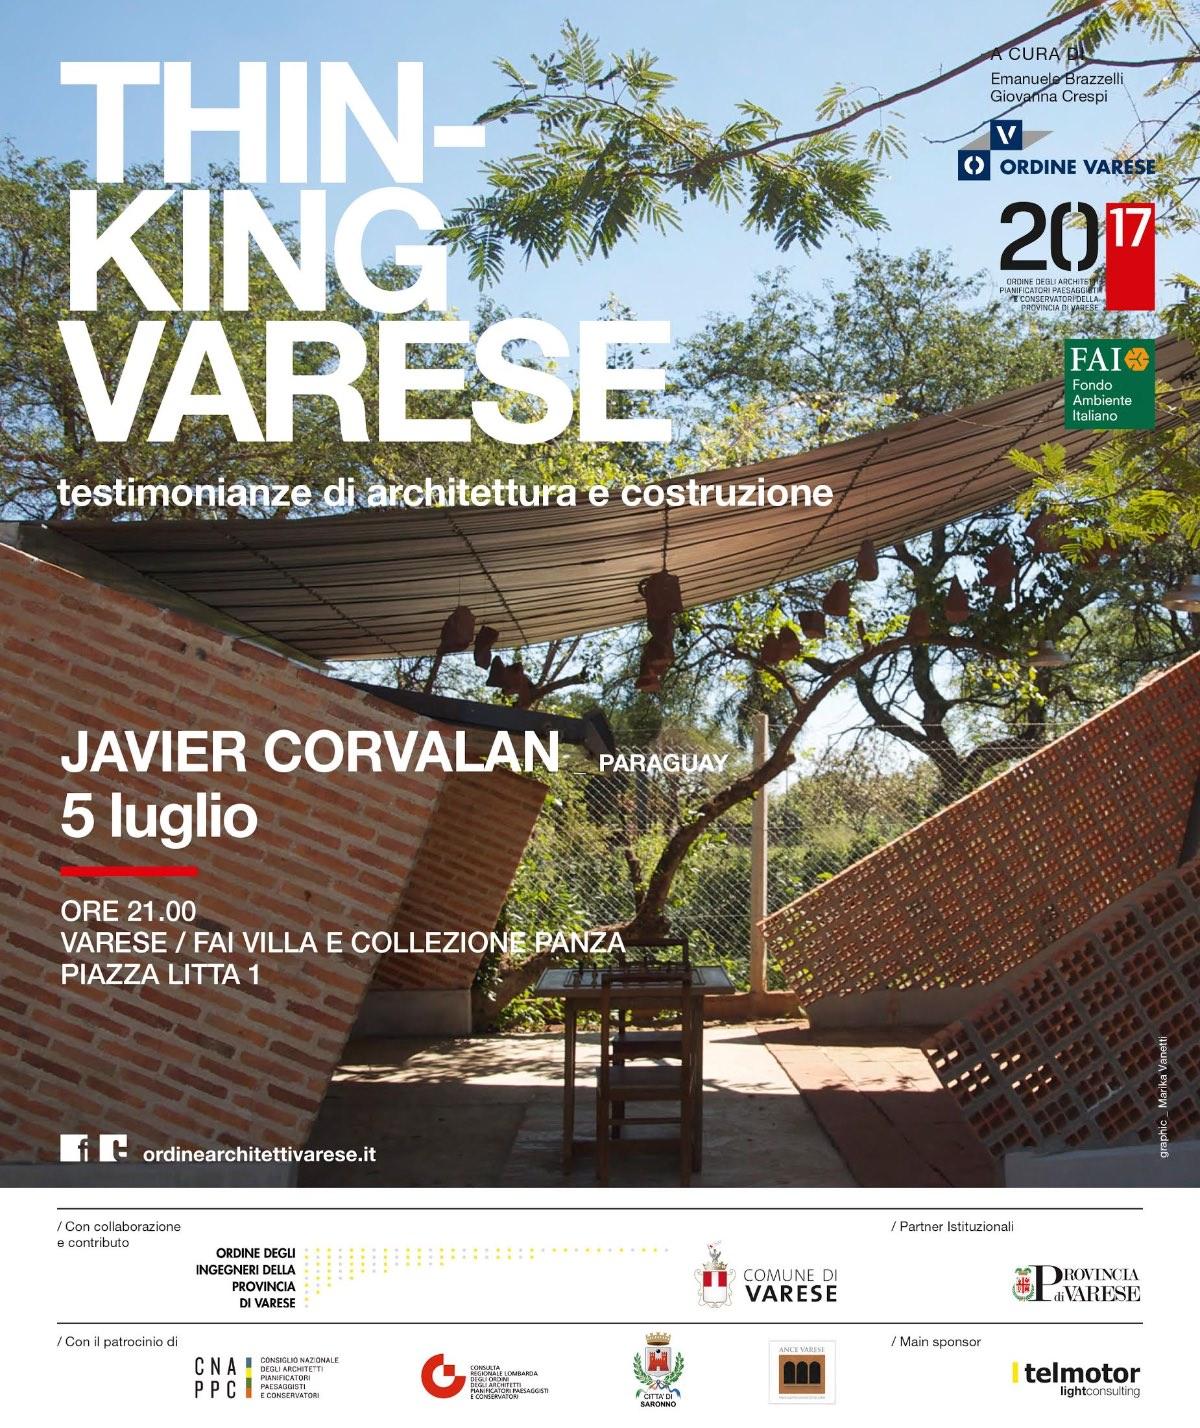 Corvalan Varese